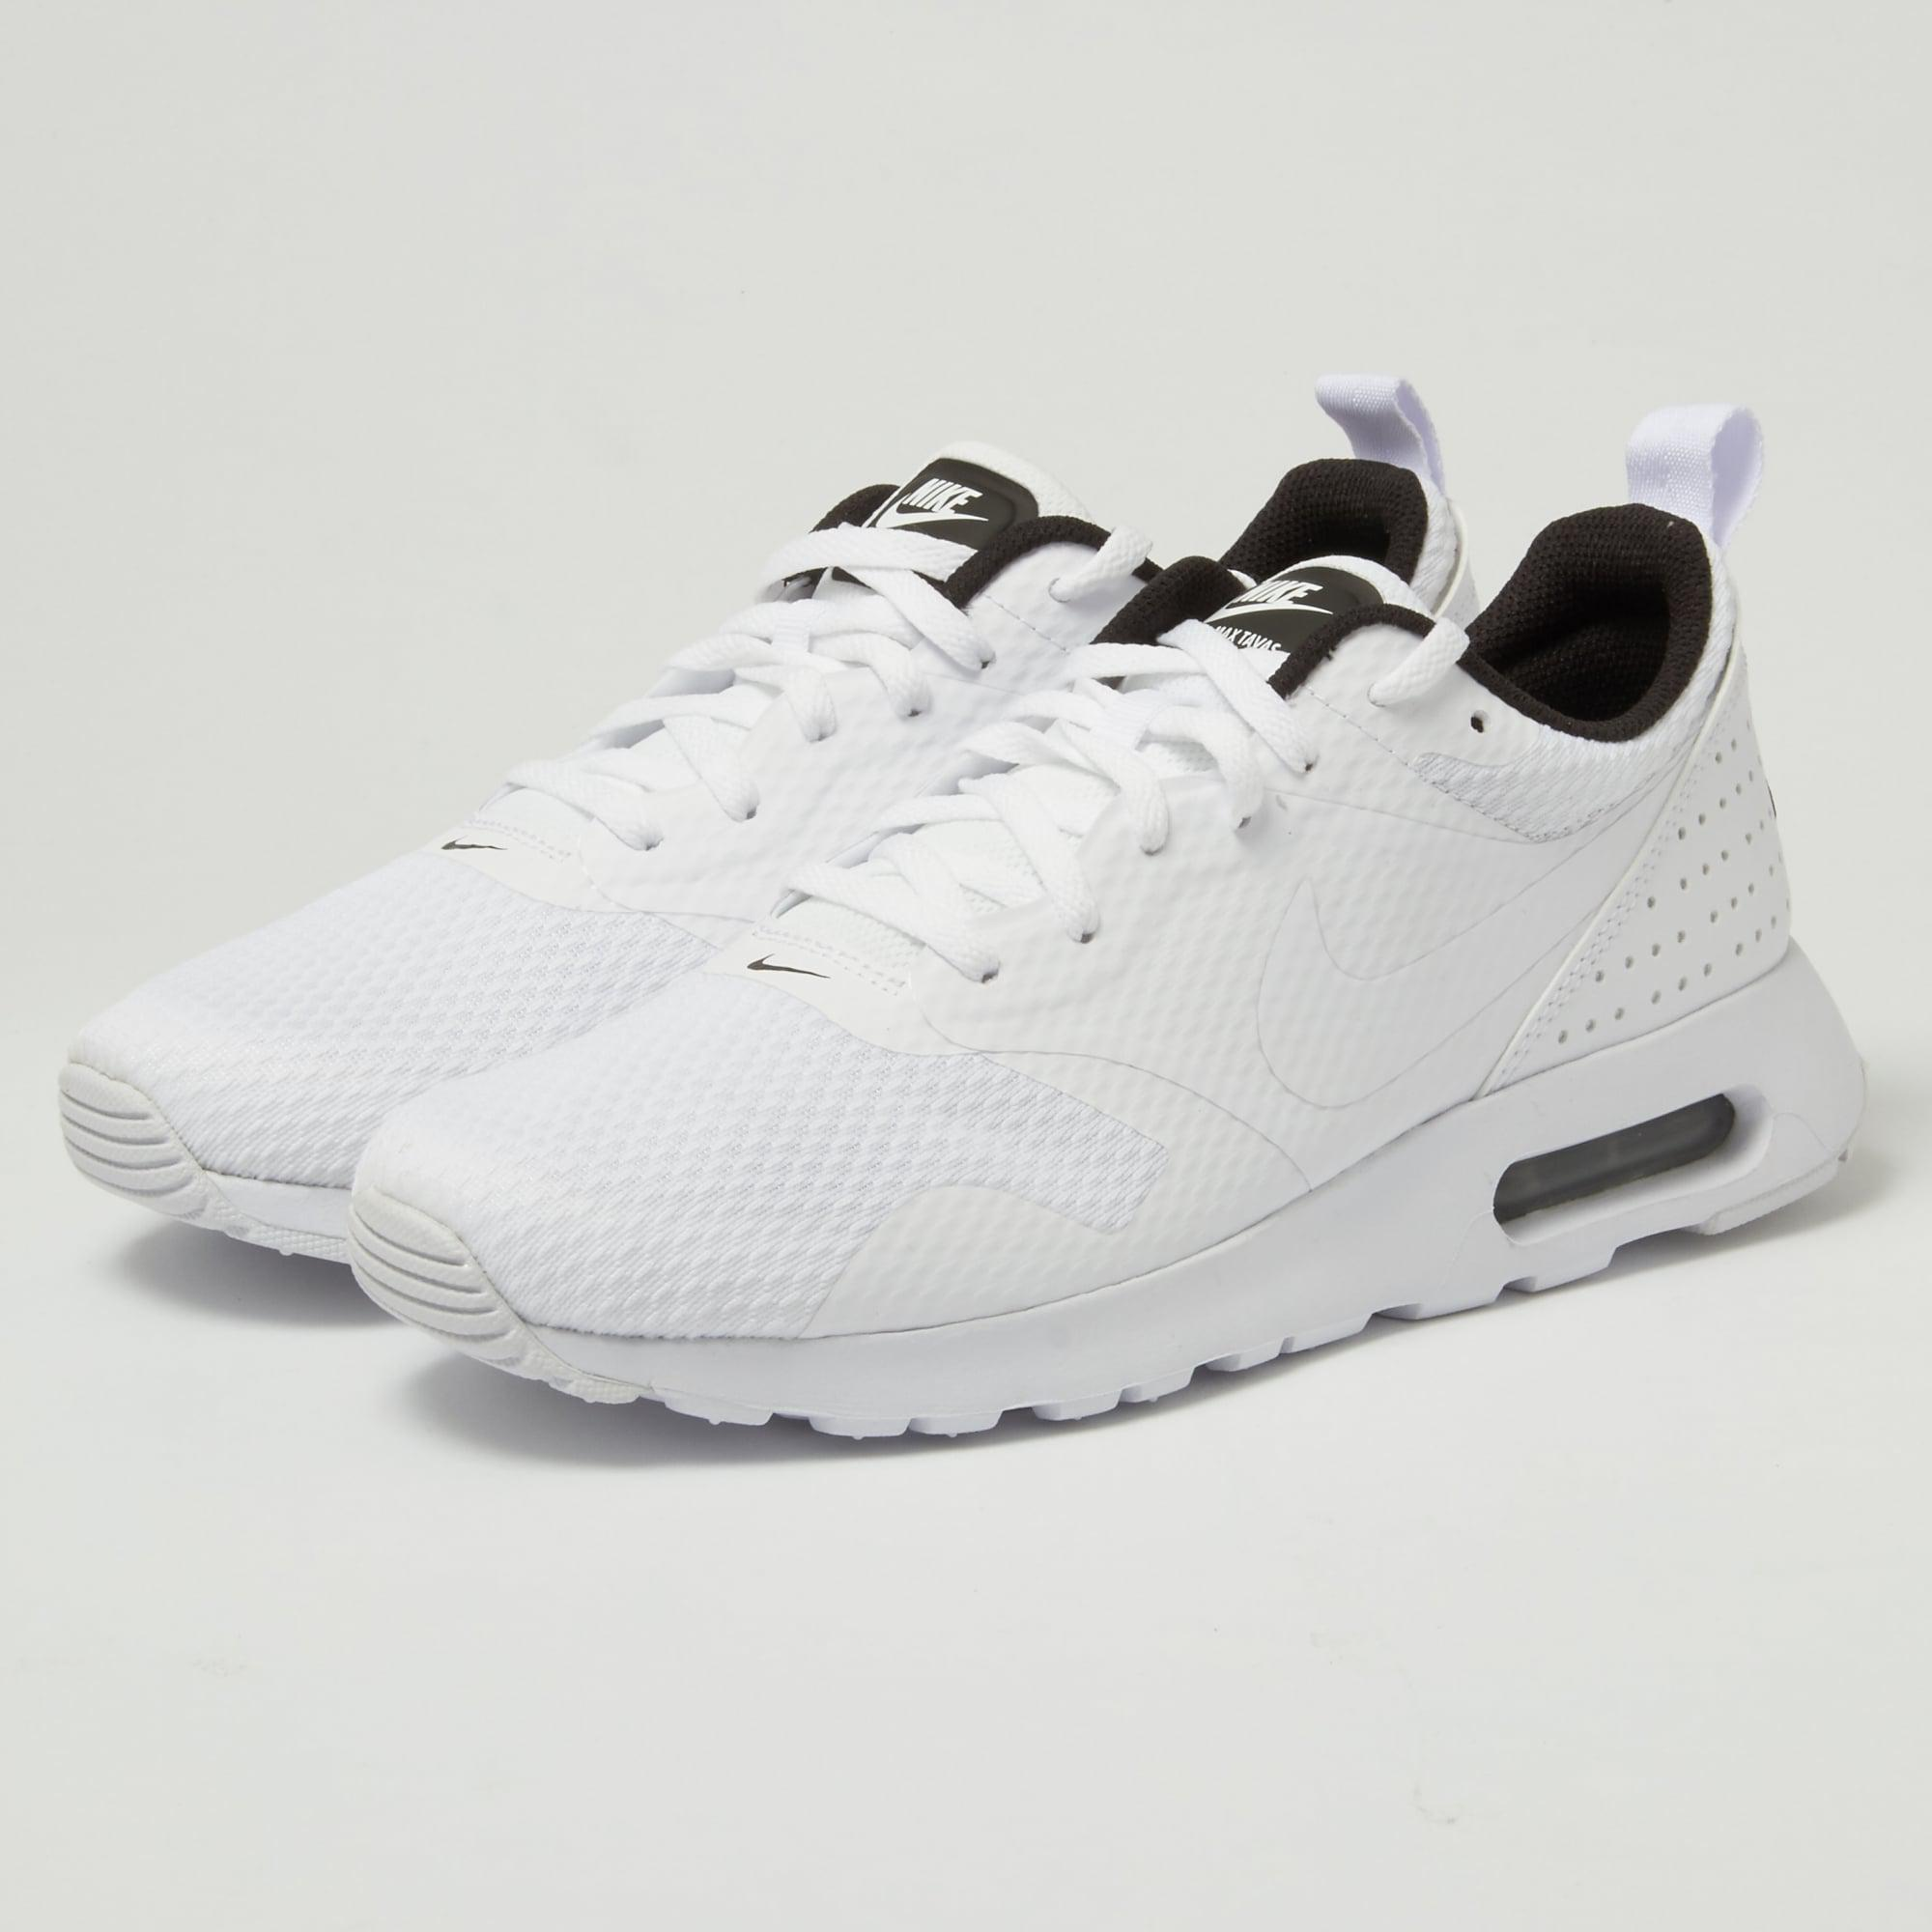 ab69501f Nike Air Max Tavas White Shoe in White for Men - Lyst